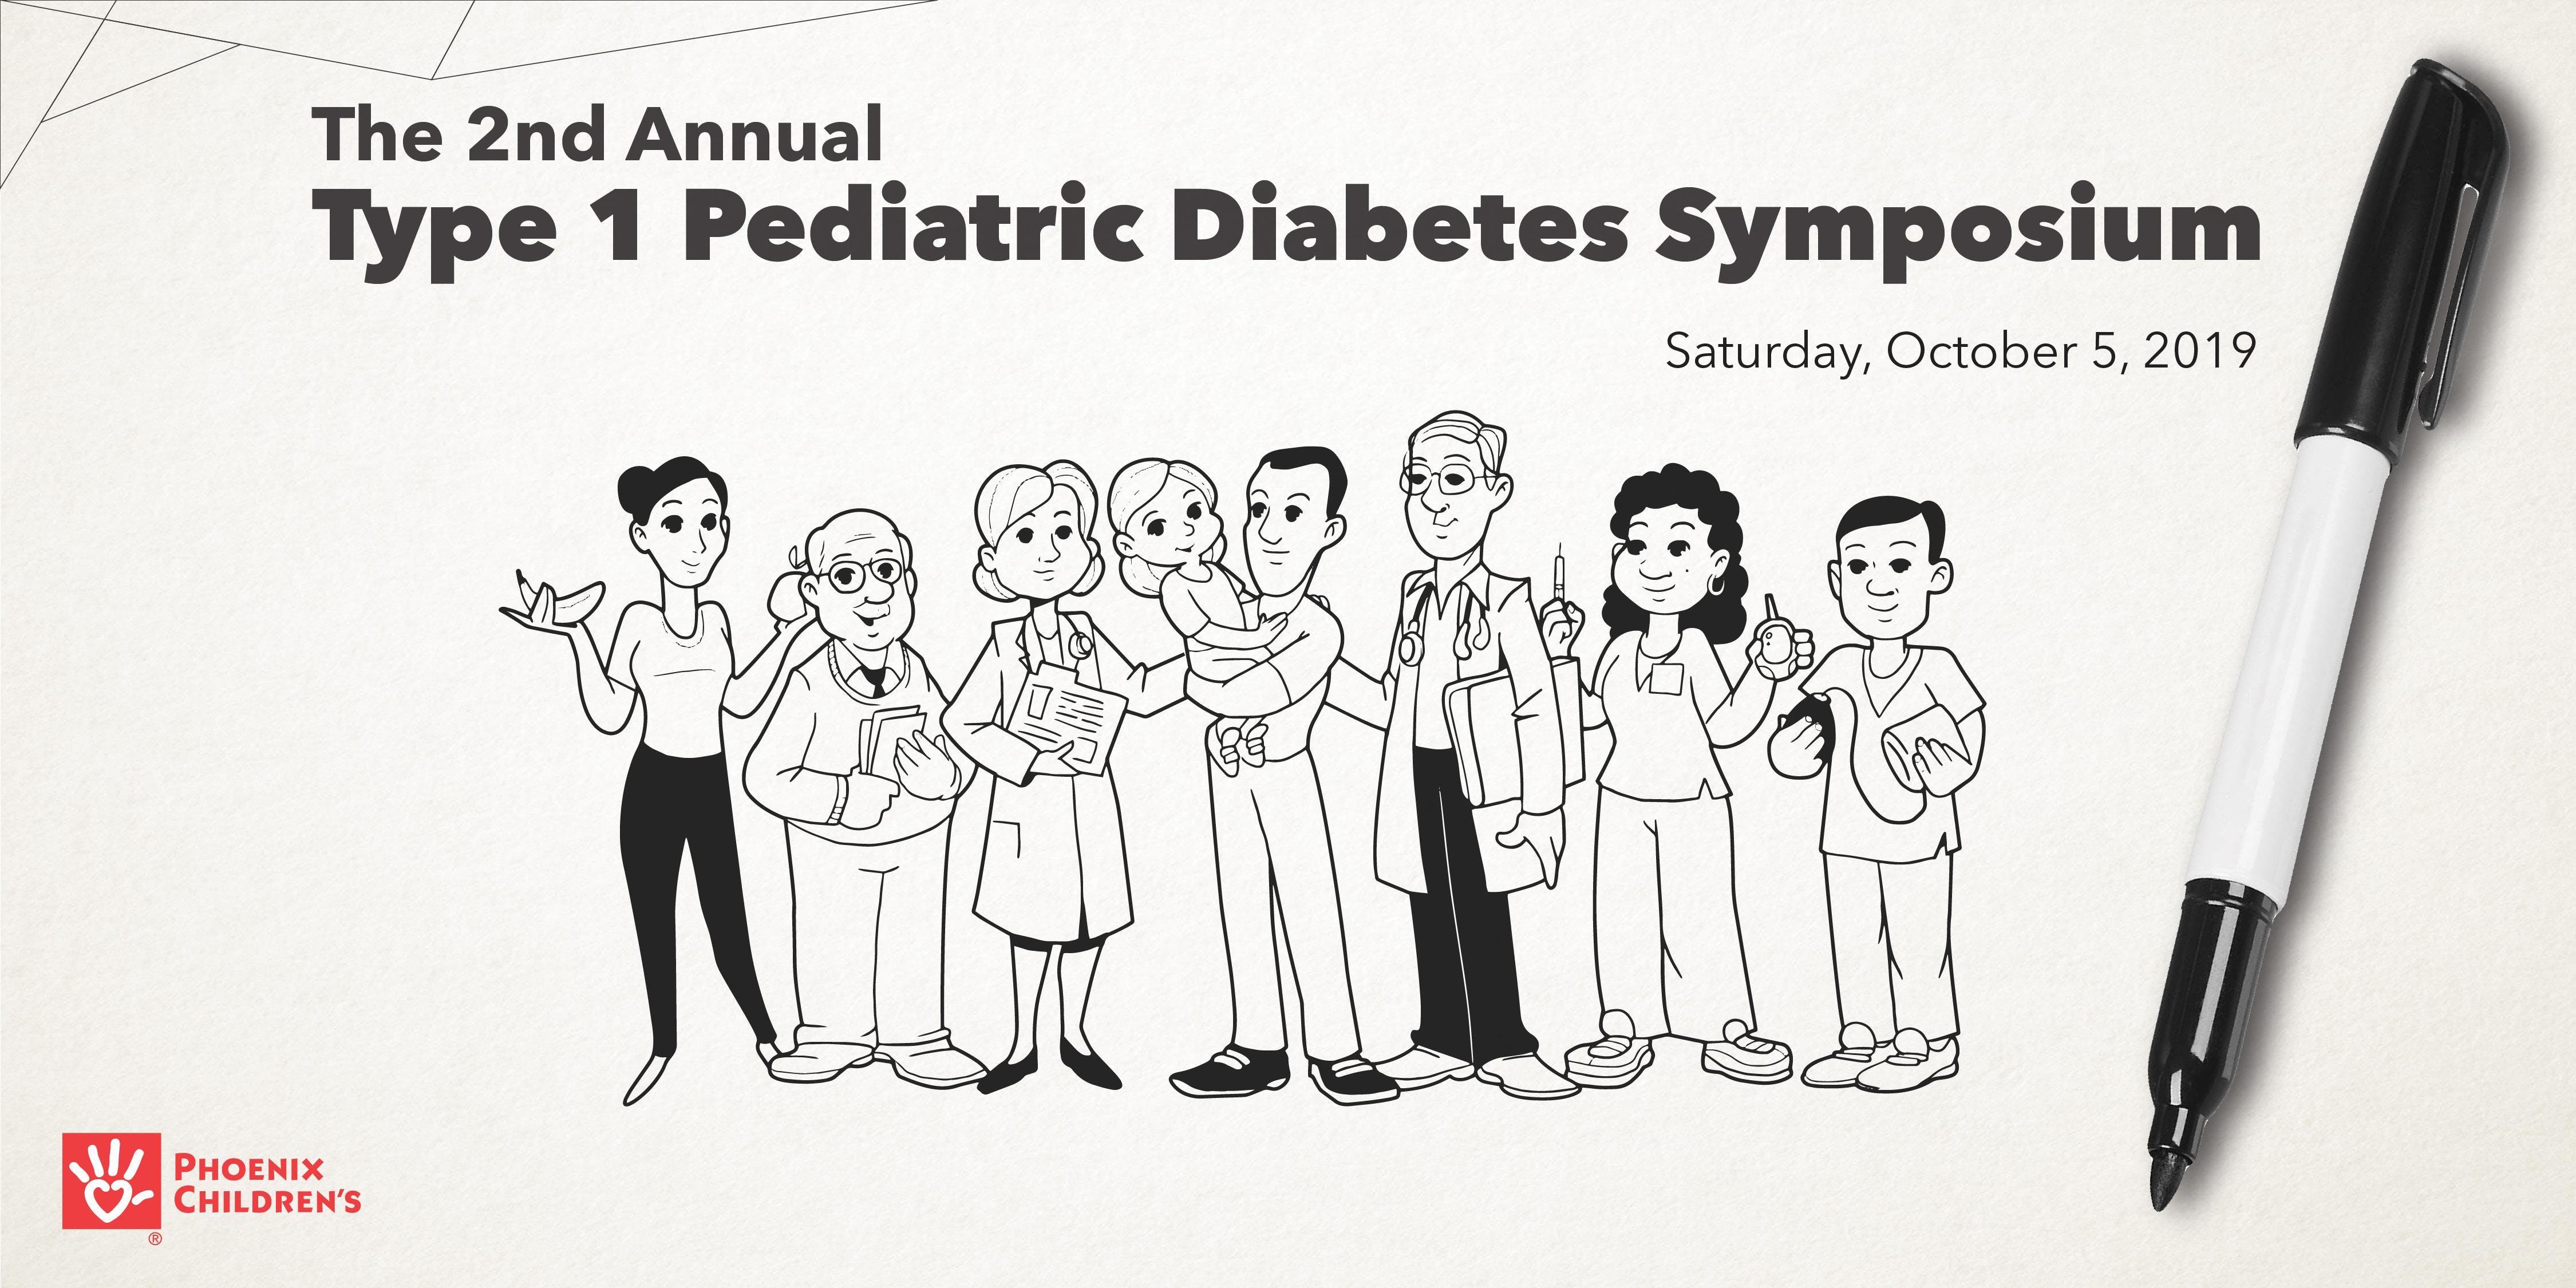 Phoenix Children's 2nd Annual Pediatric Type 1 Diabetes Symposium 2019